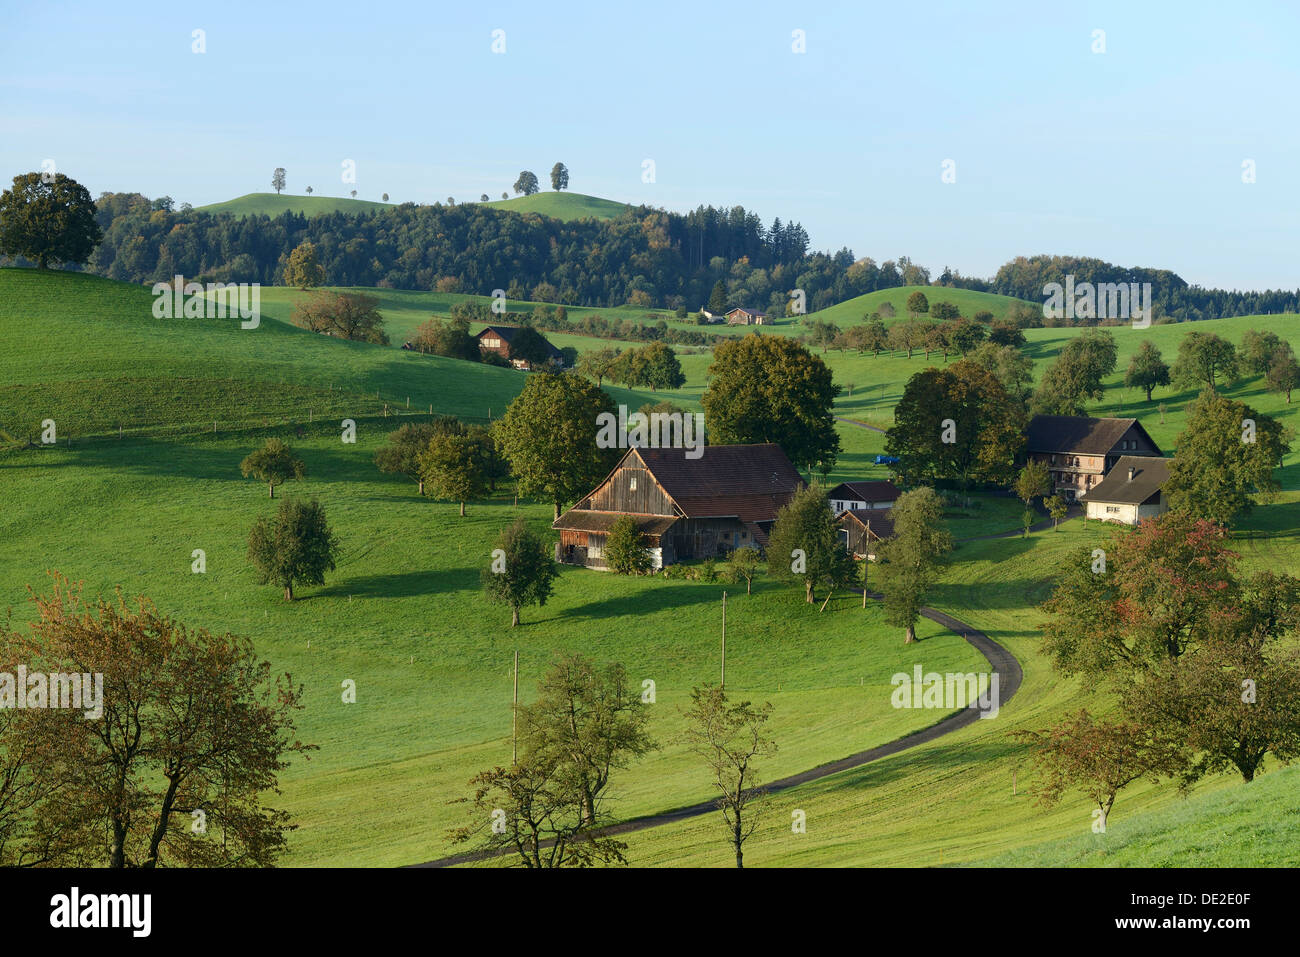 Una fattoria in autunno, Schwand, Zug, Svizzera, Europa Immagini Stock